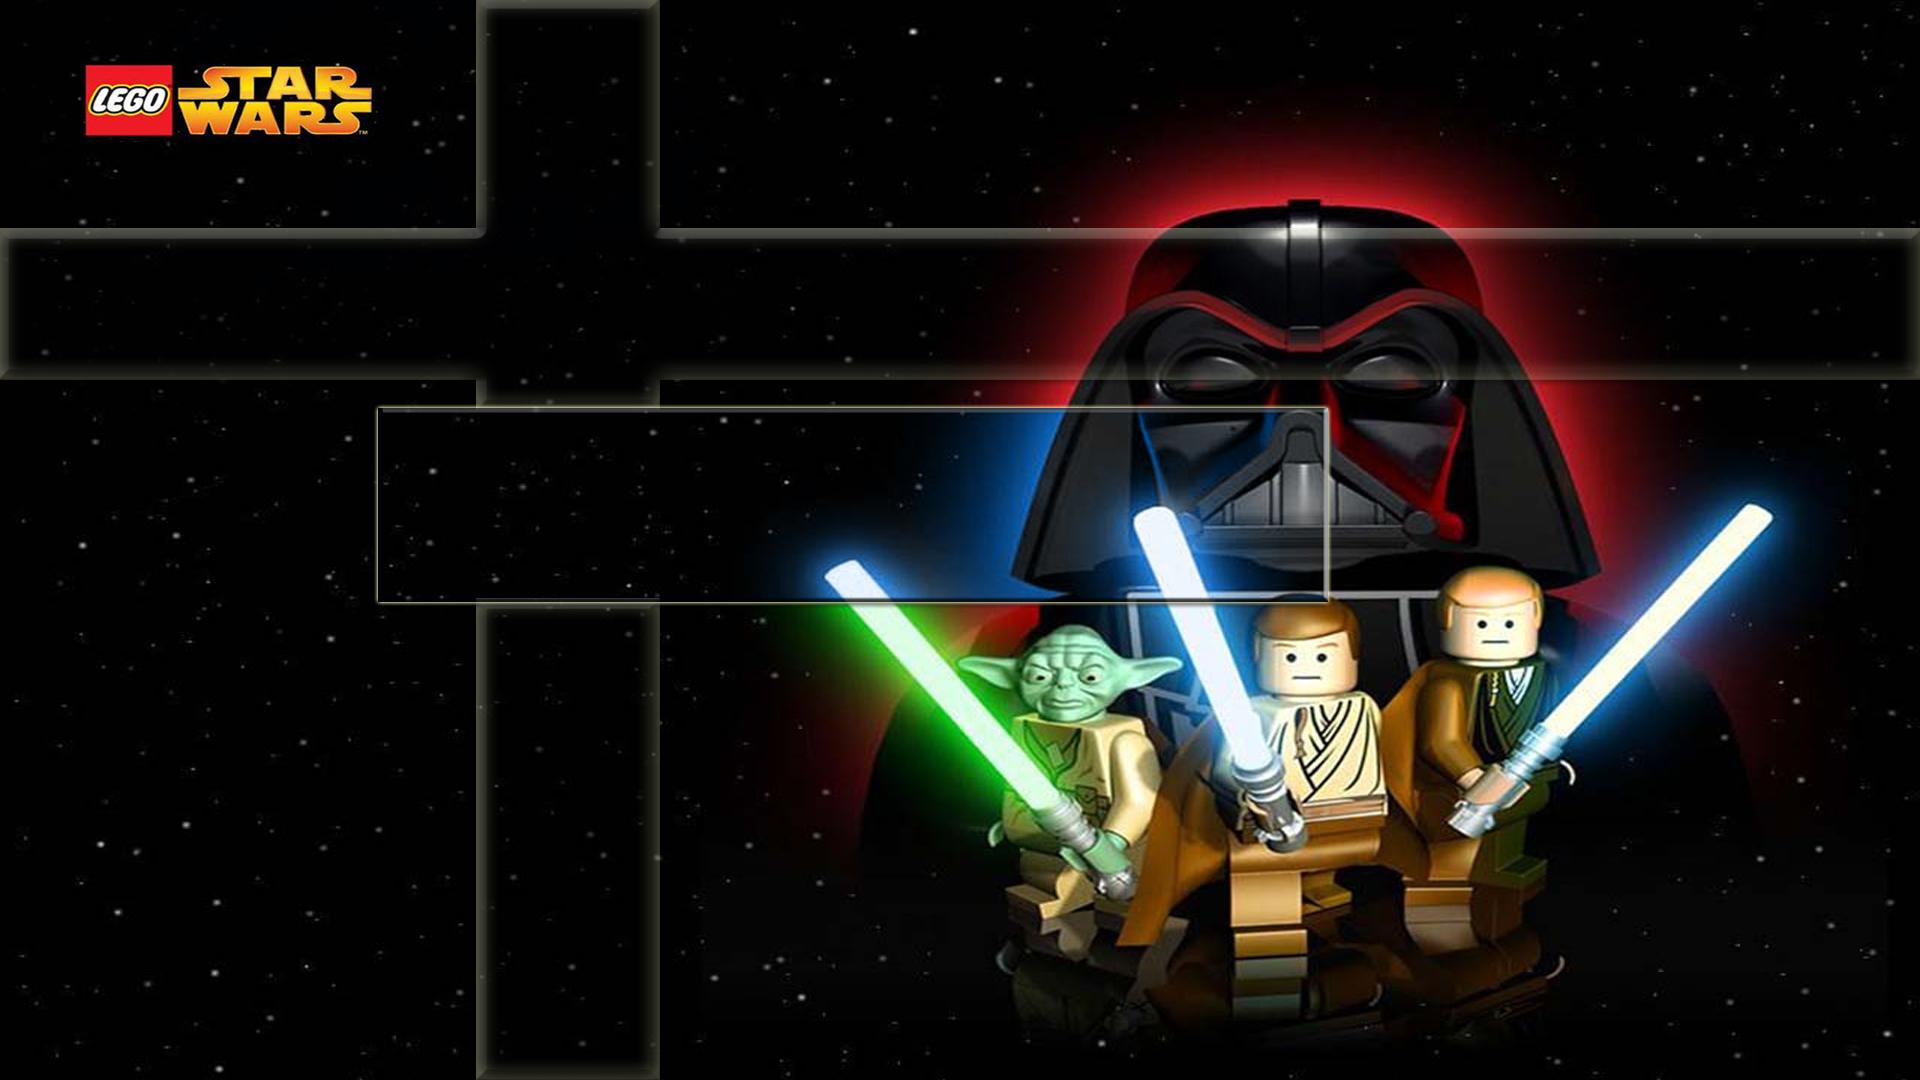 Inspirational Star Wars Quotes Wallpaper Lego Star Wars Wallpaper Hd Pixelstalk Net